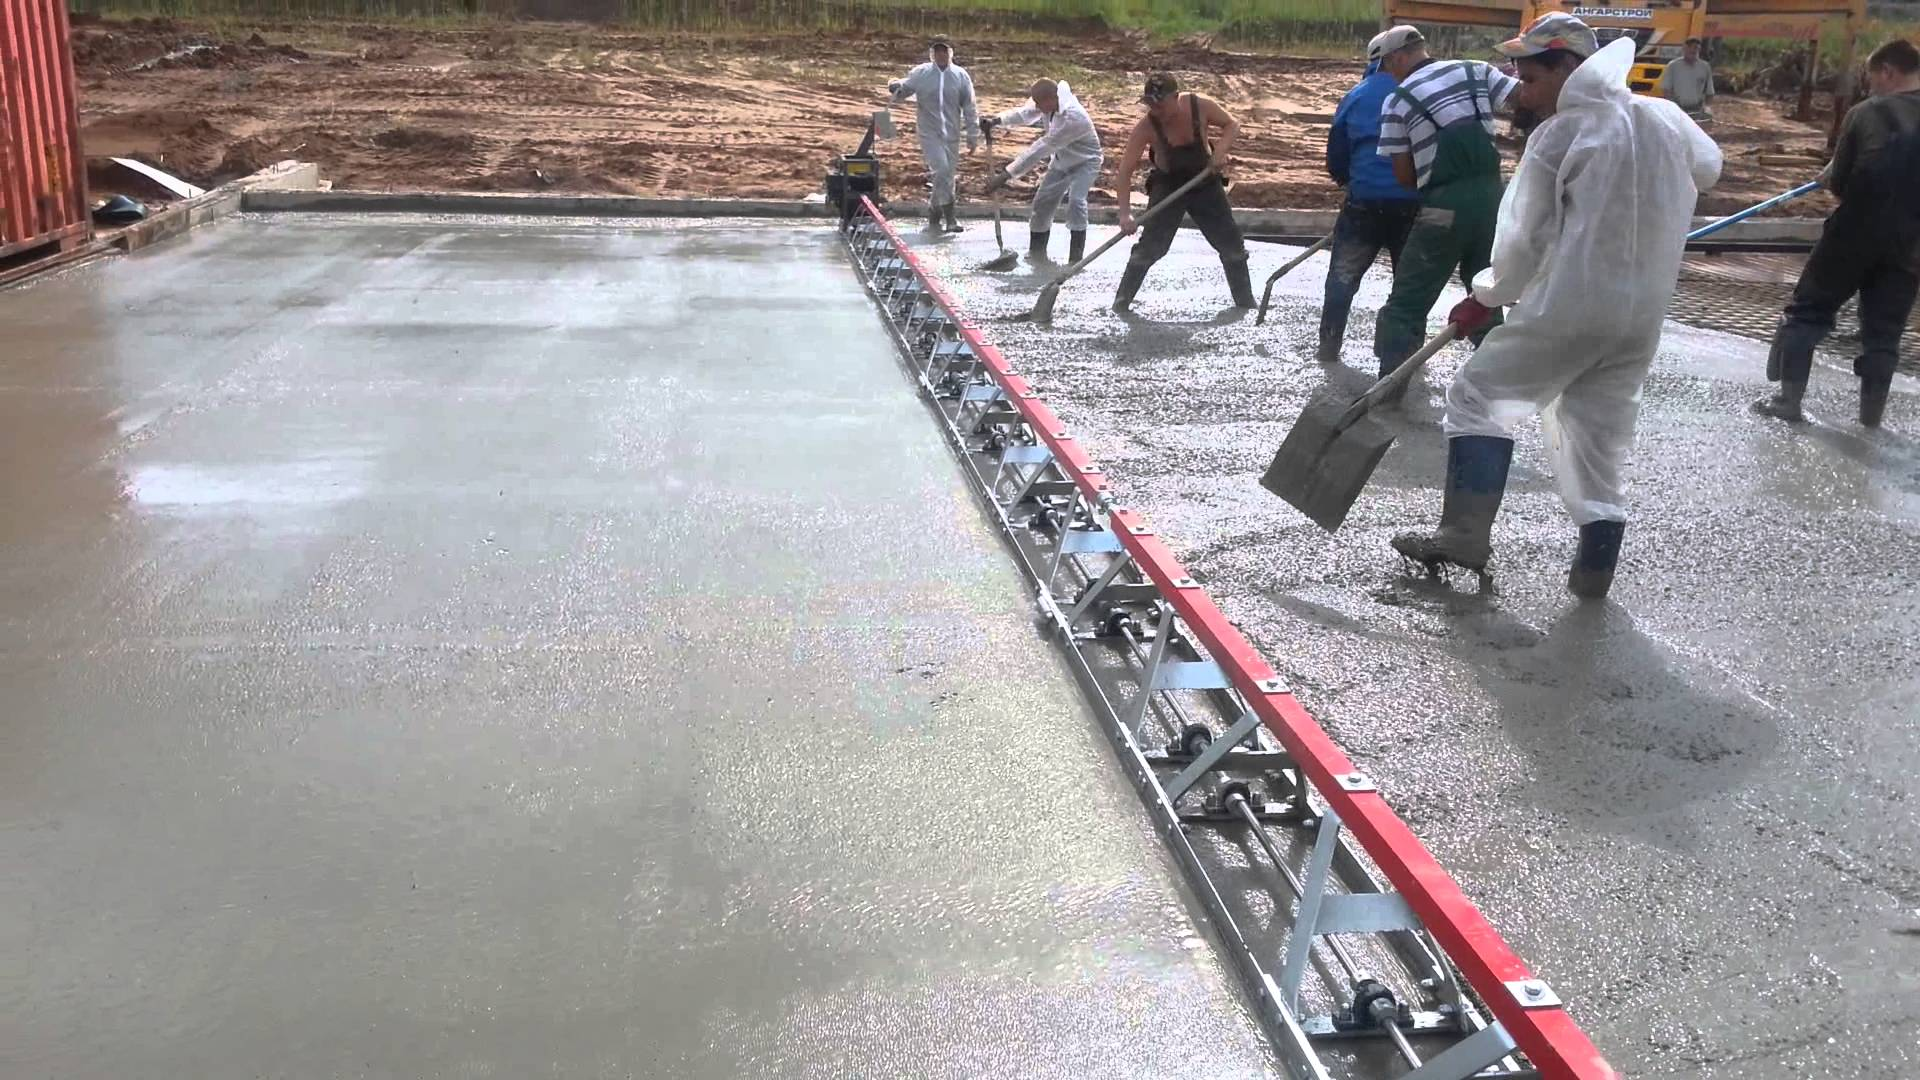 вибратора для бетона своими руками